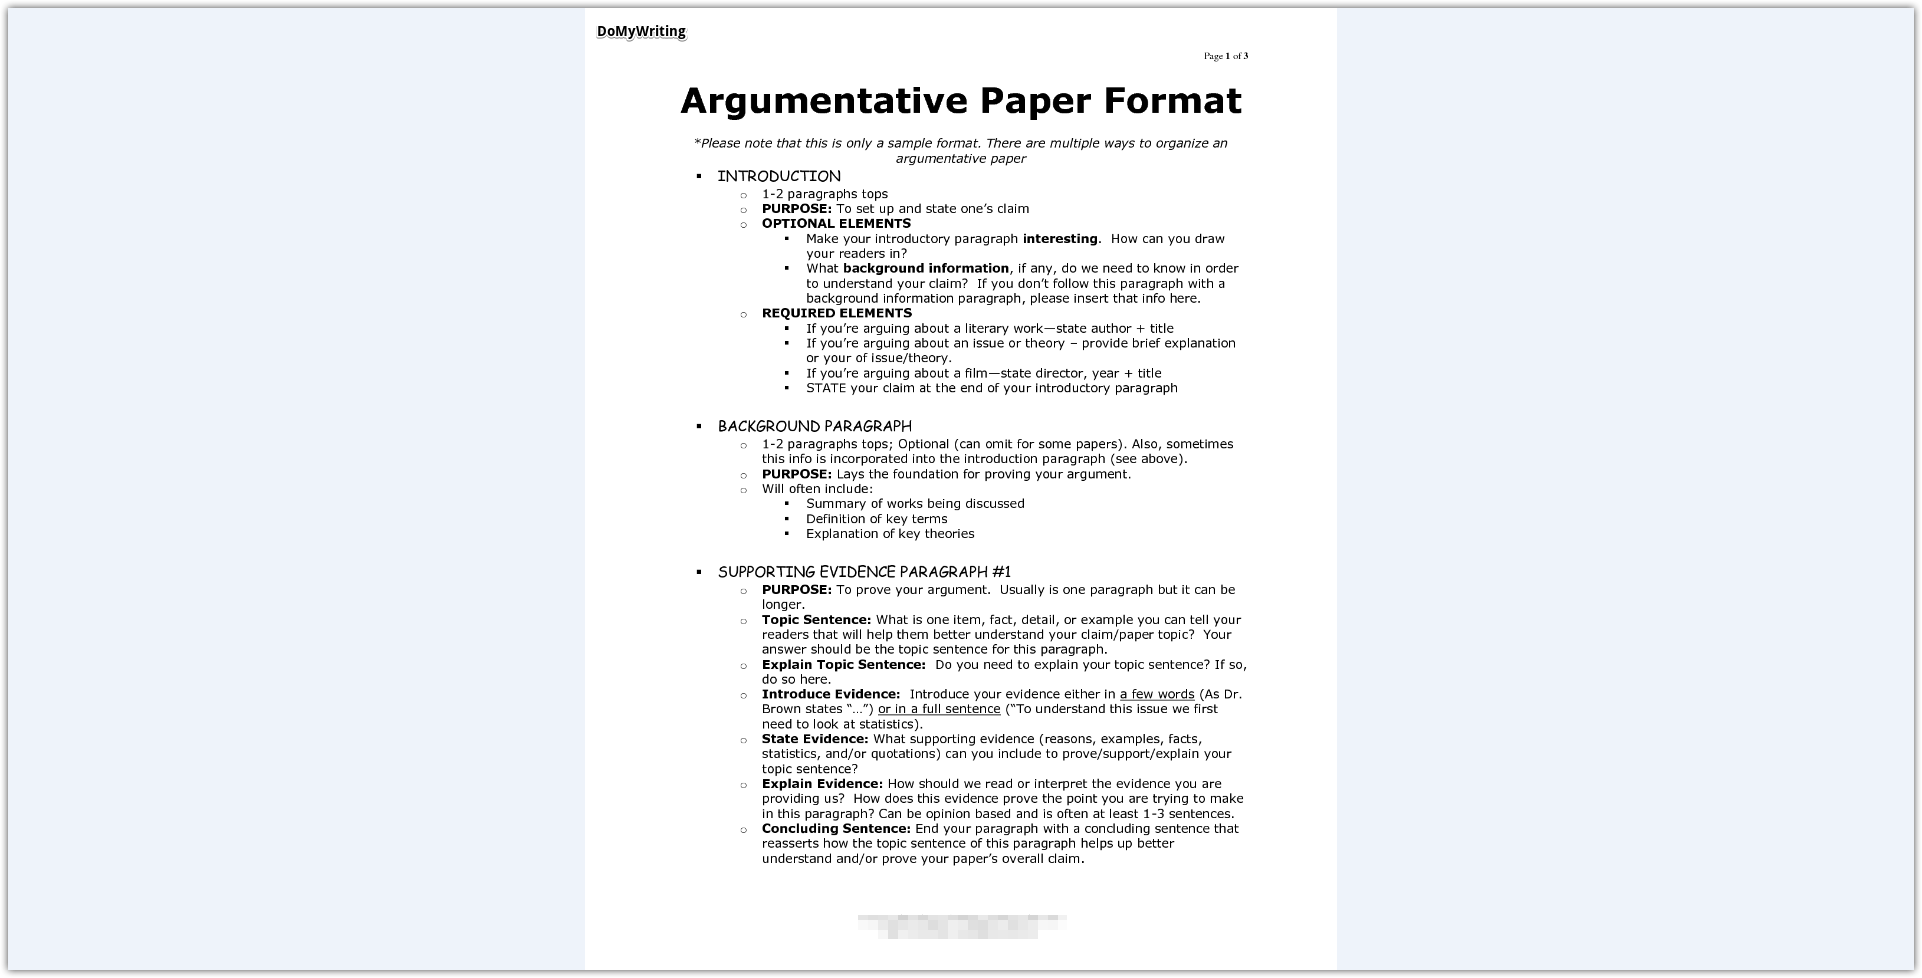 009 Essay Example Argumentative Format Controversial Excellent Topics Non Current Full